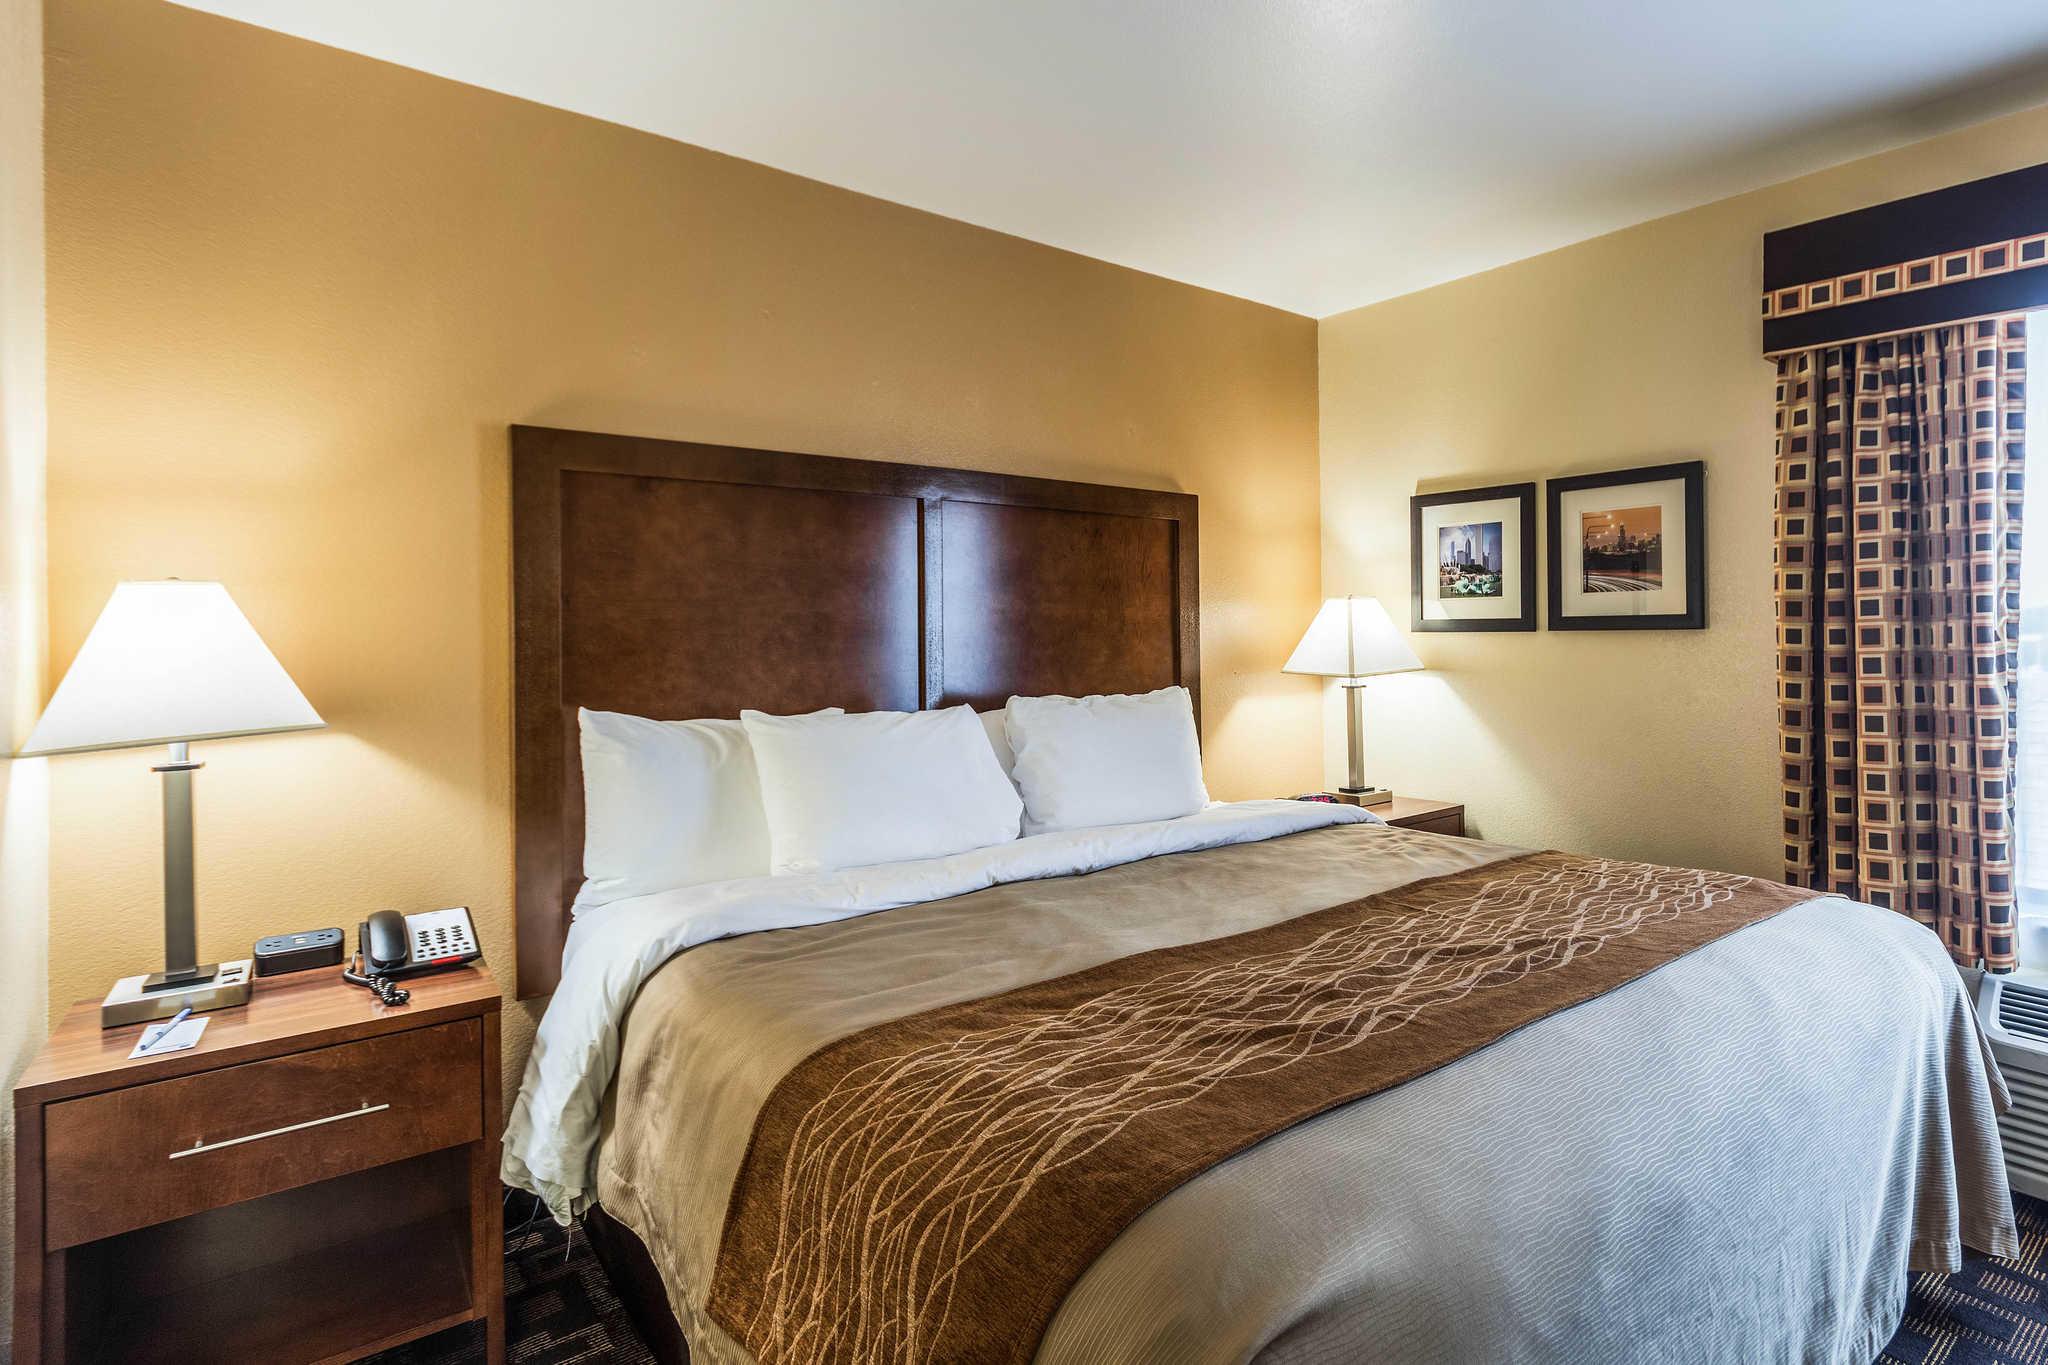 Comfort Inn & Suites North Aurora - Naperville image 21